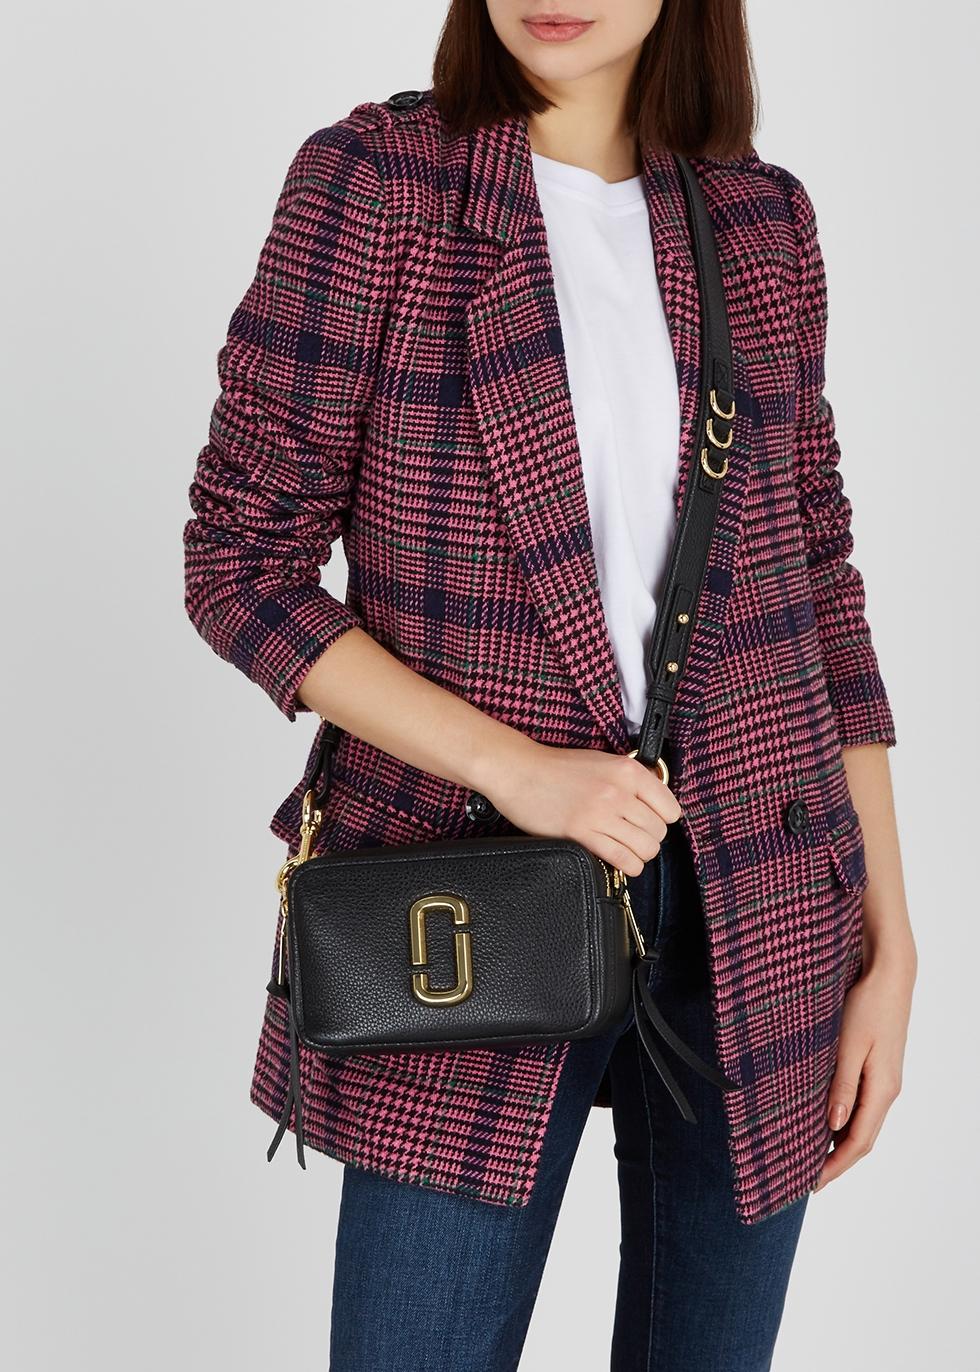 a2ad0ac983fb Marc Jacobs Softshot 21 black leather shoulder bag - Harvey Nichols